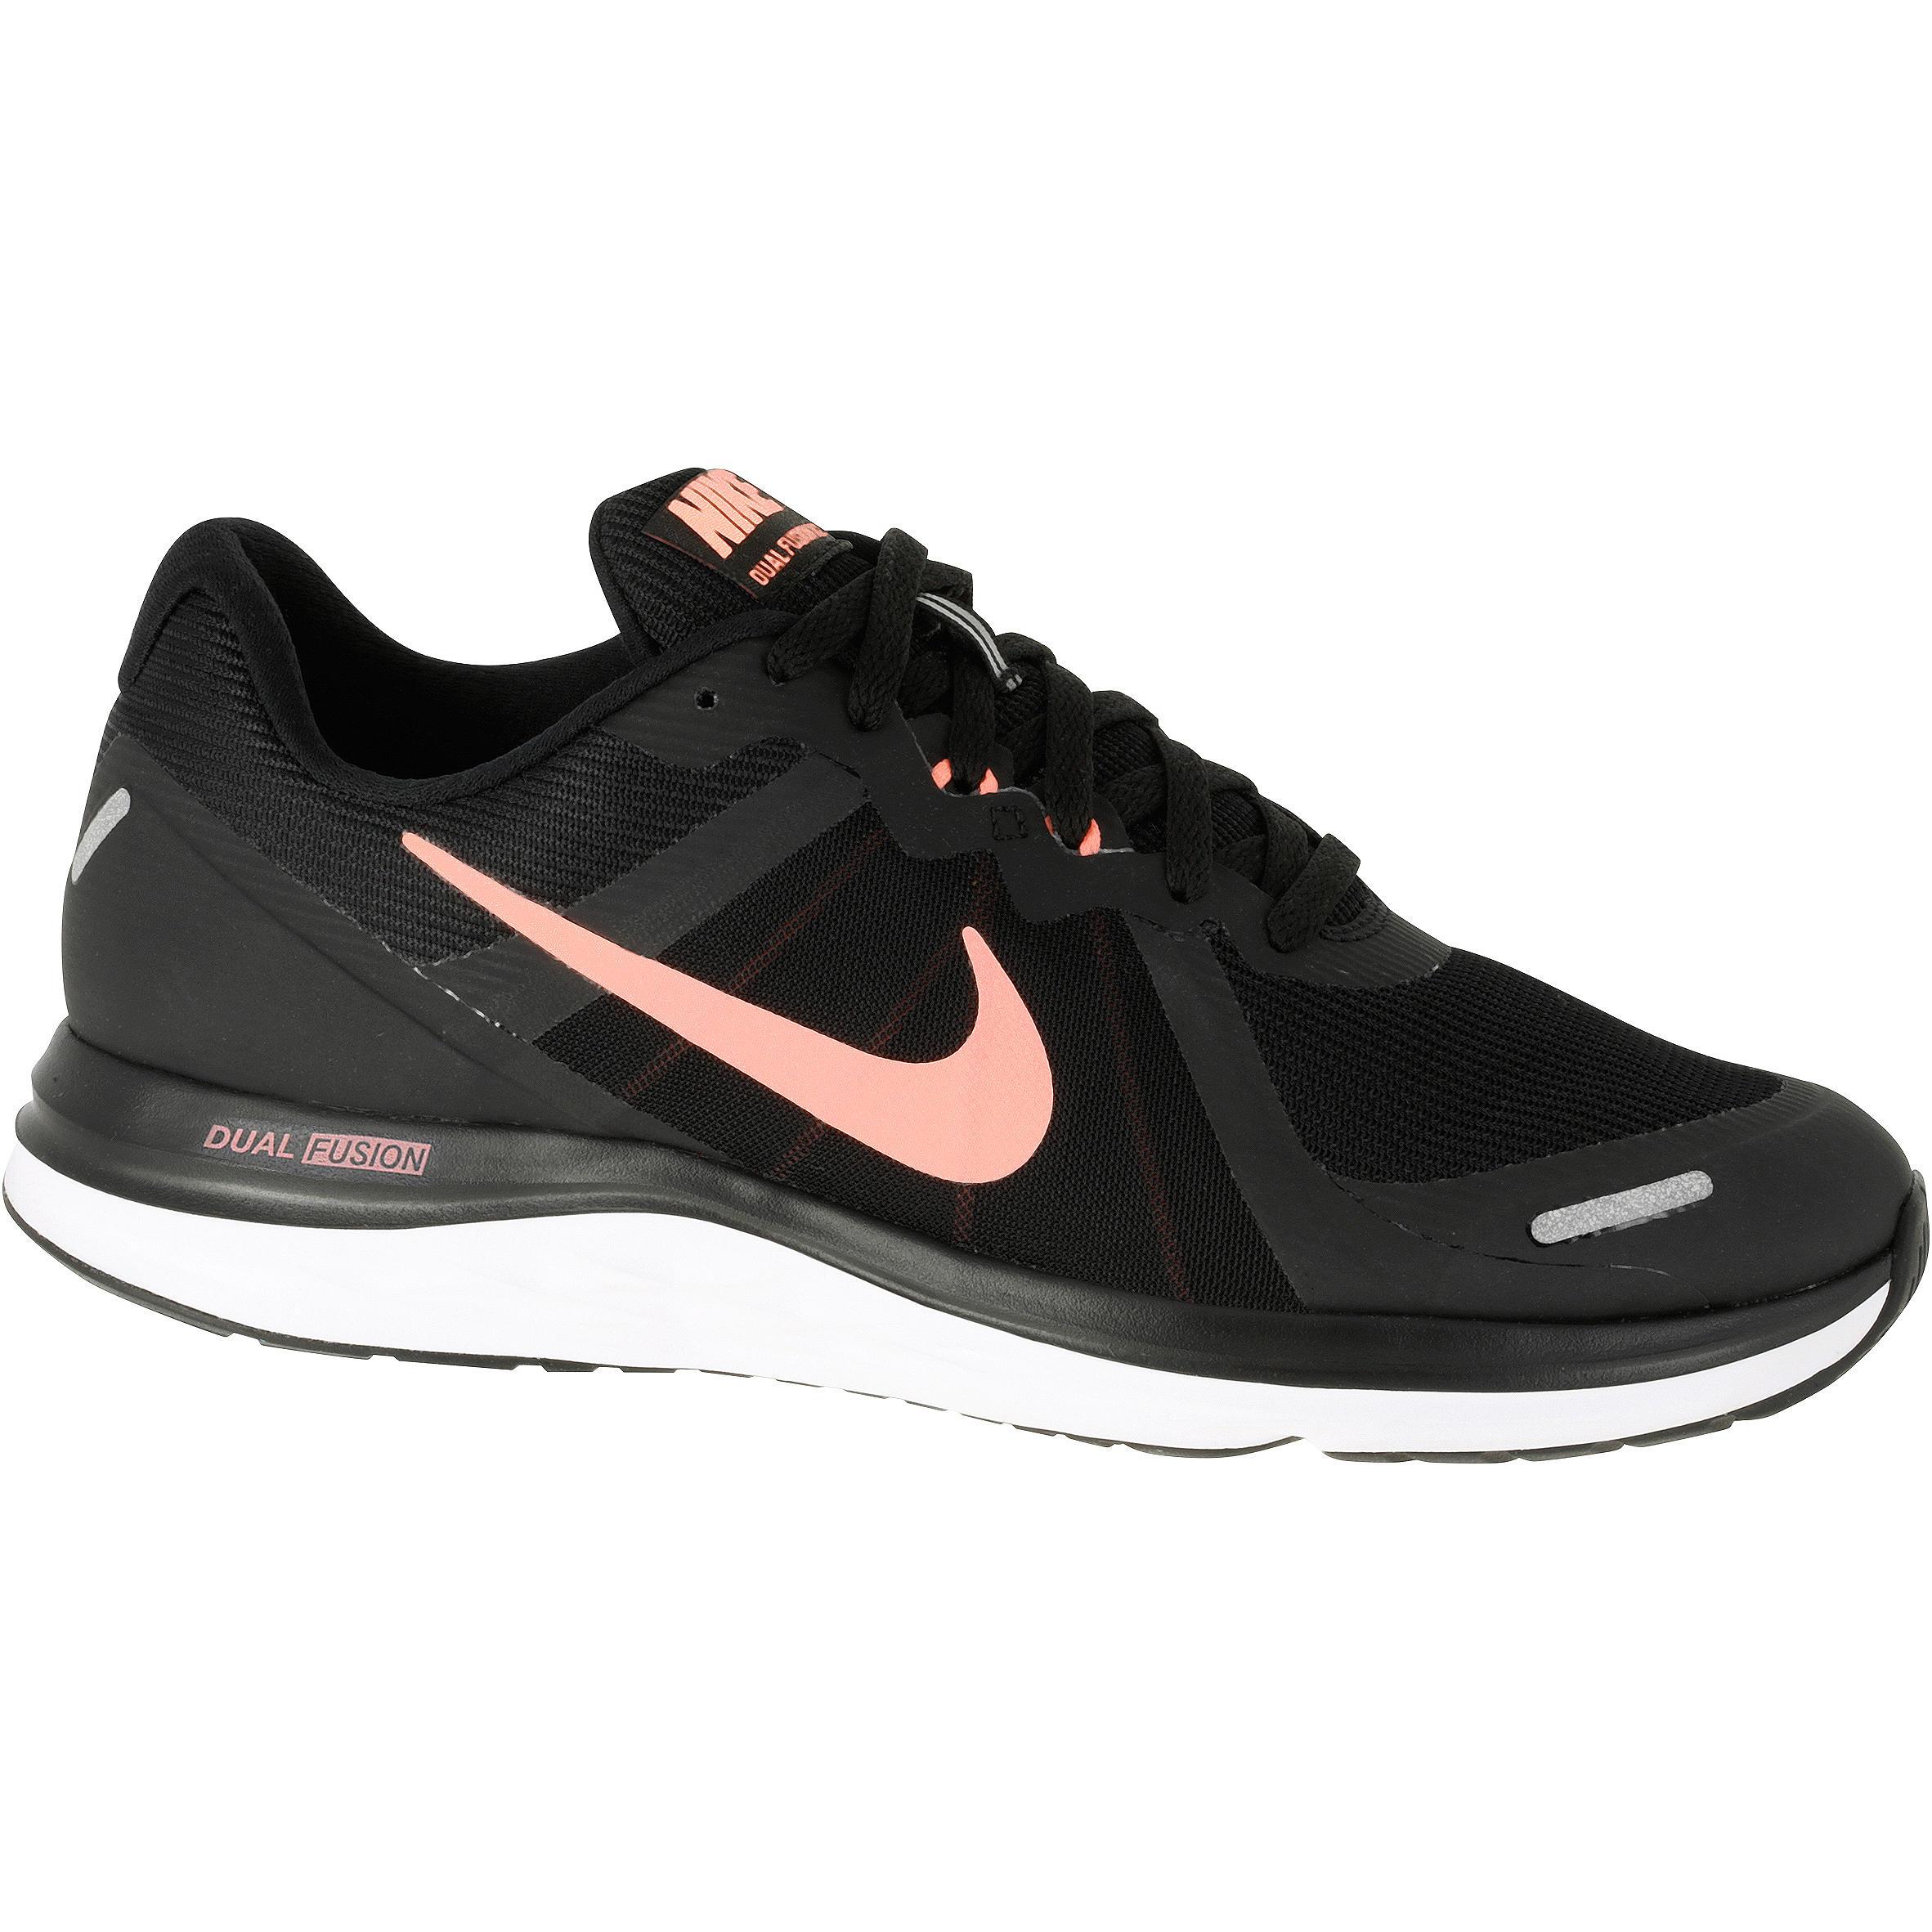 2bc0770ed61d2 Zapatillas de running mujer NIKE DUAL FUSION X2 negro Nike